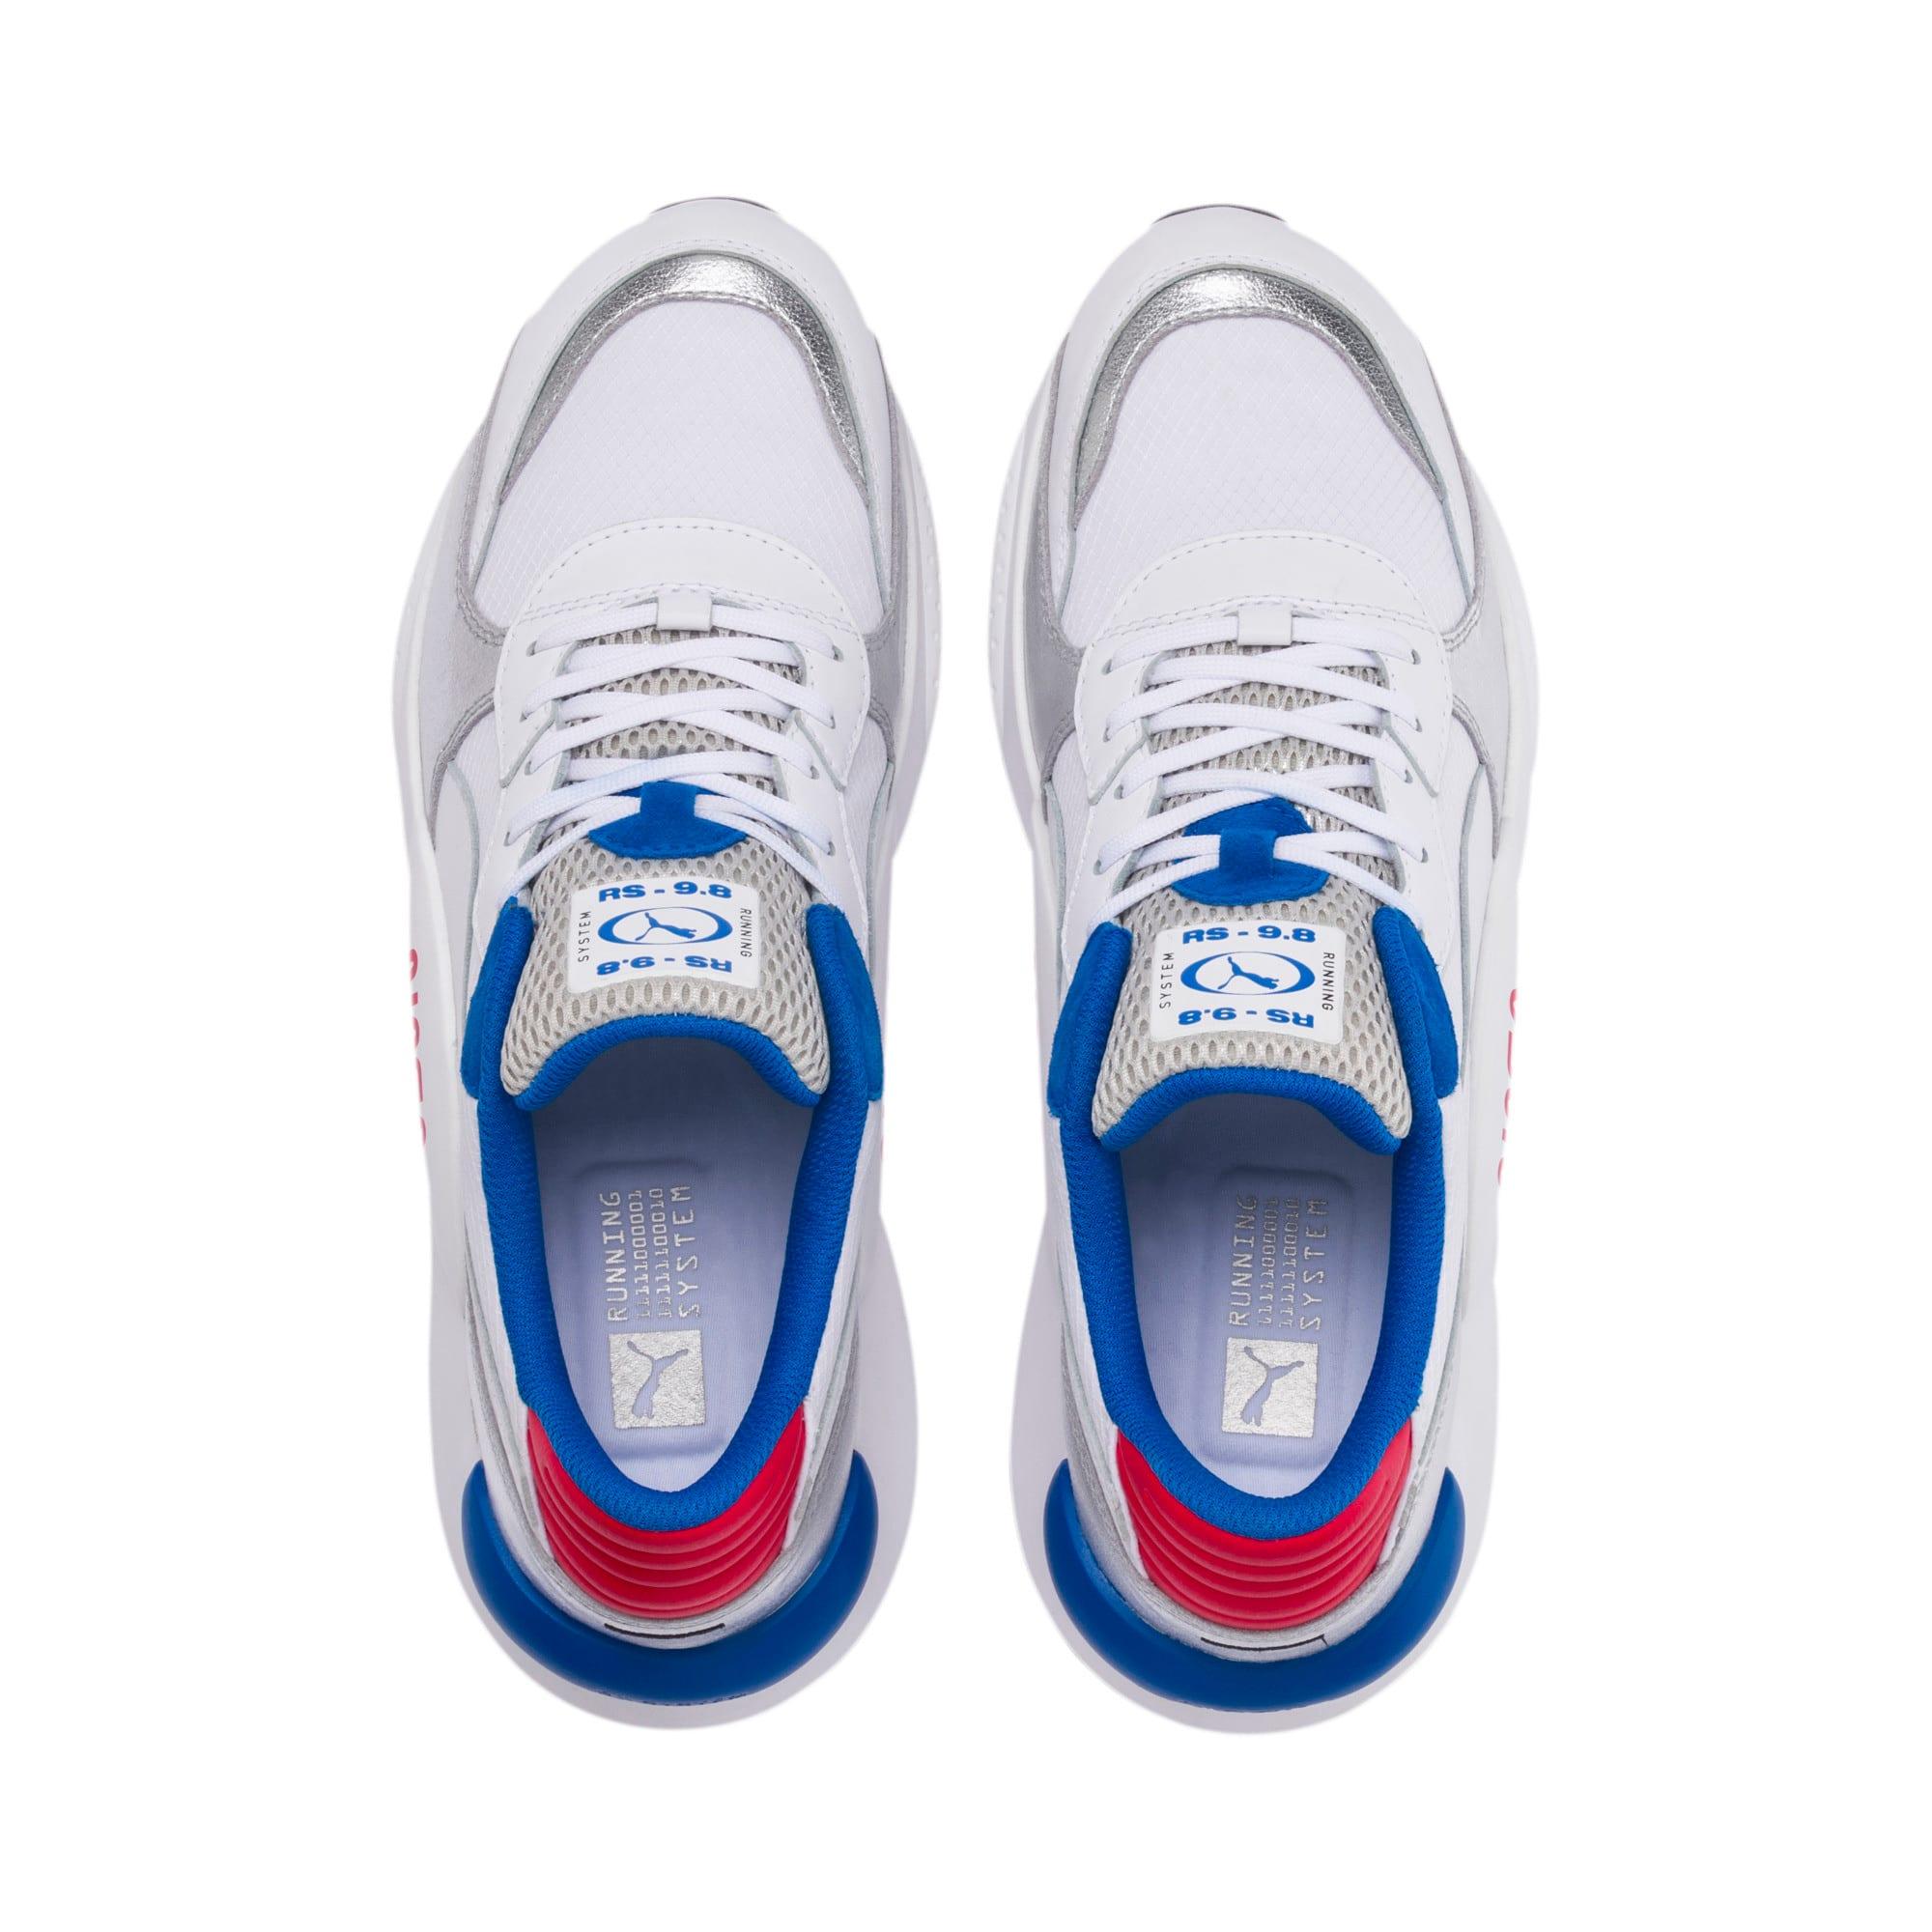 Thumbnail 6 of RS 9.8 Space Agency Sneakers, Puma White-Puma Silver, medium